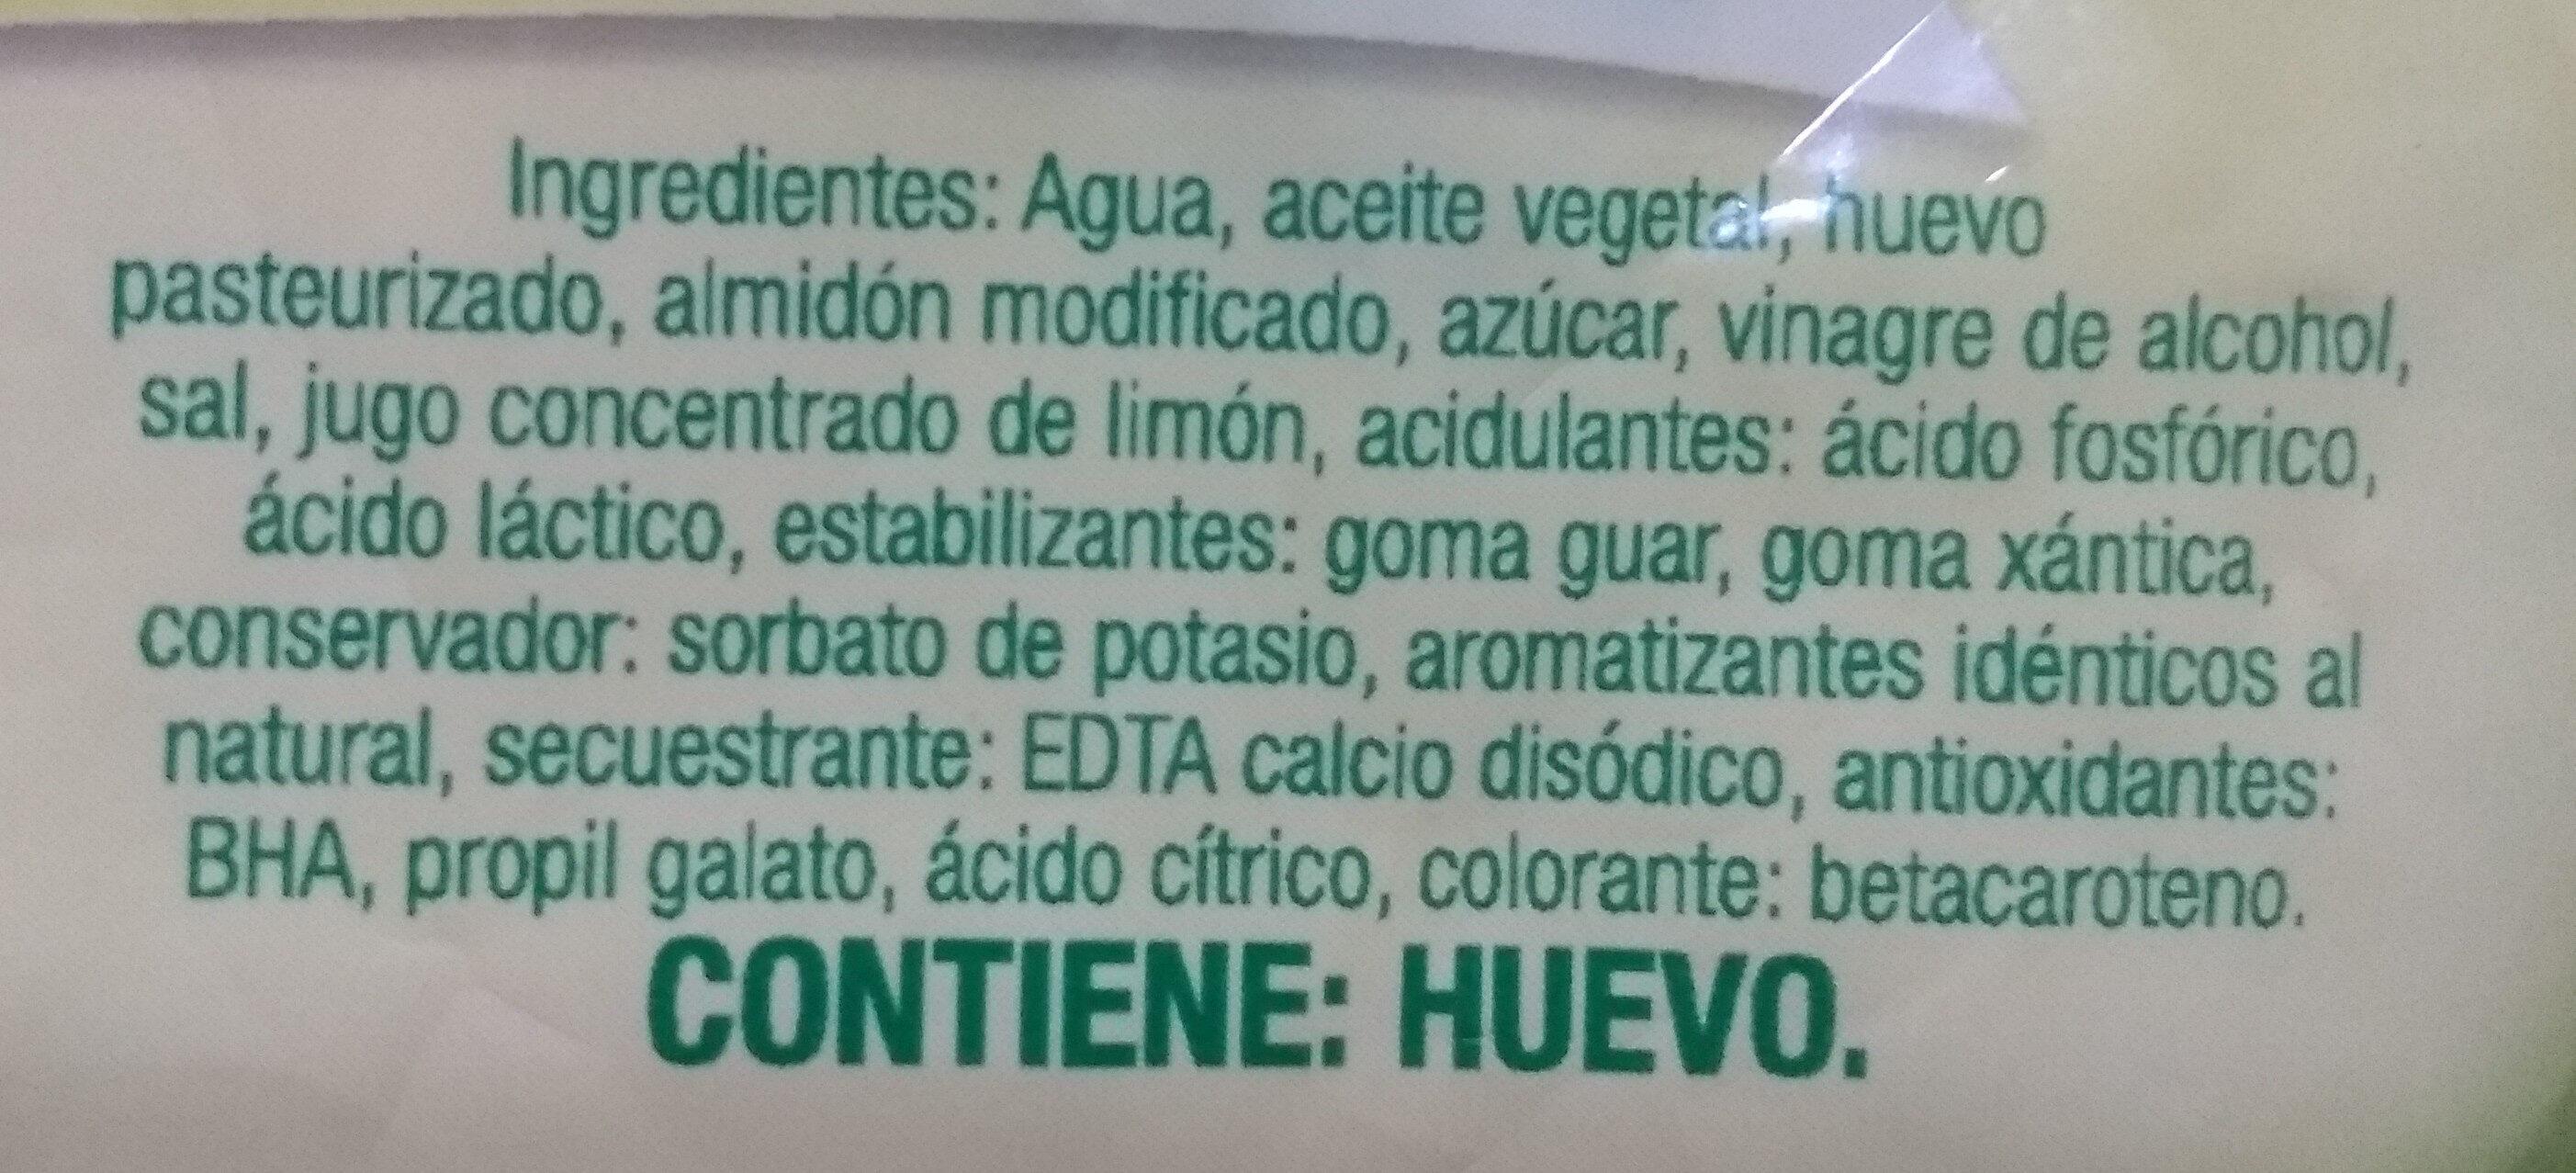 Mayonesa - Ingrédients